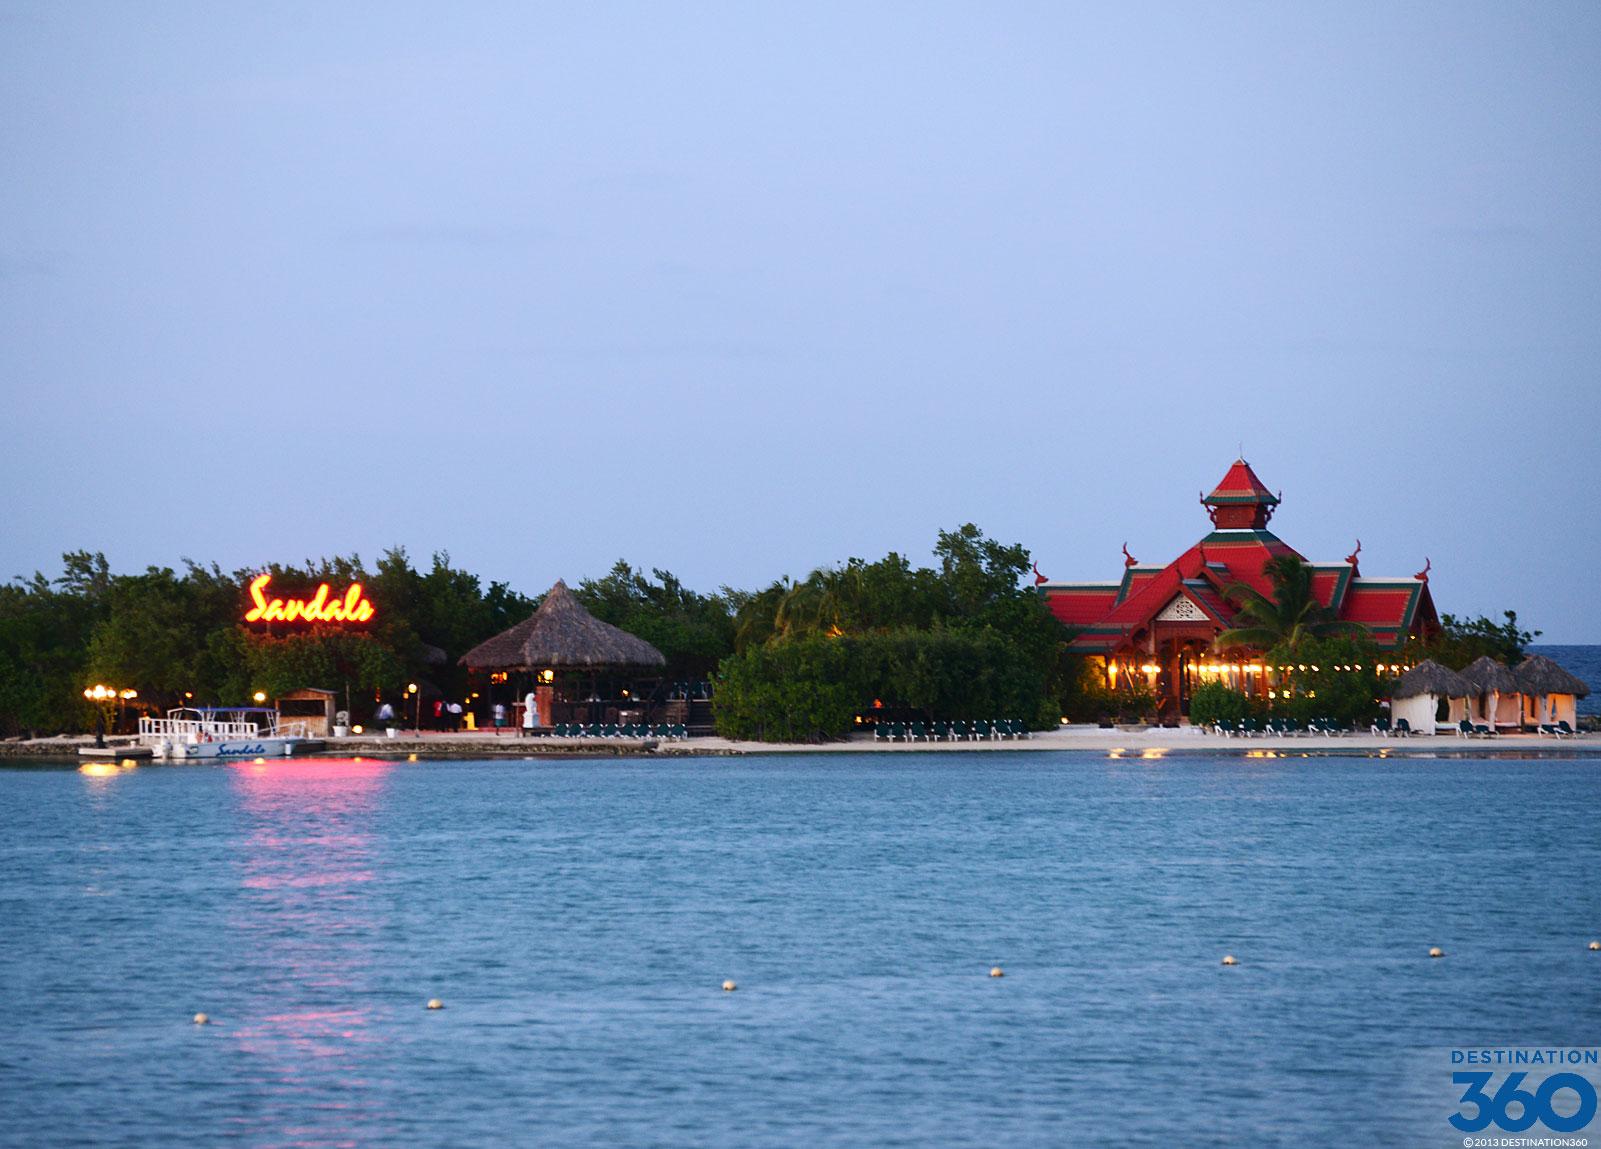 Sandals Resorts Jamaica